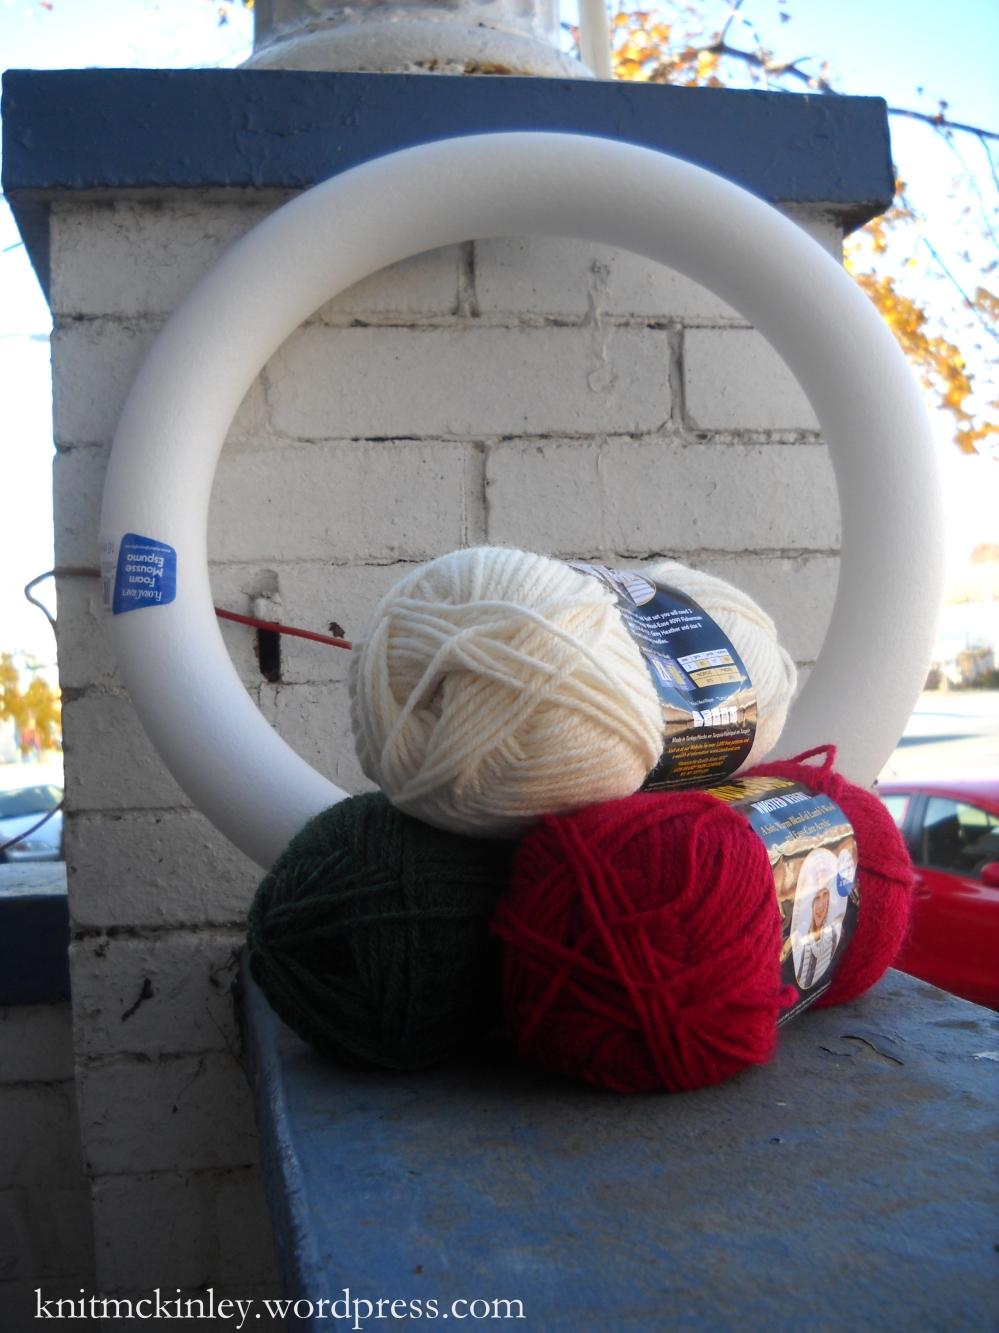 The yarn and wreath frame.